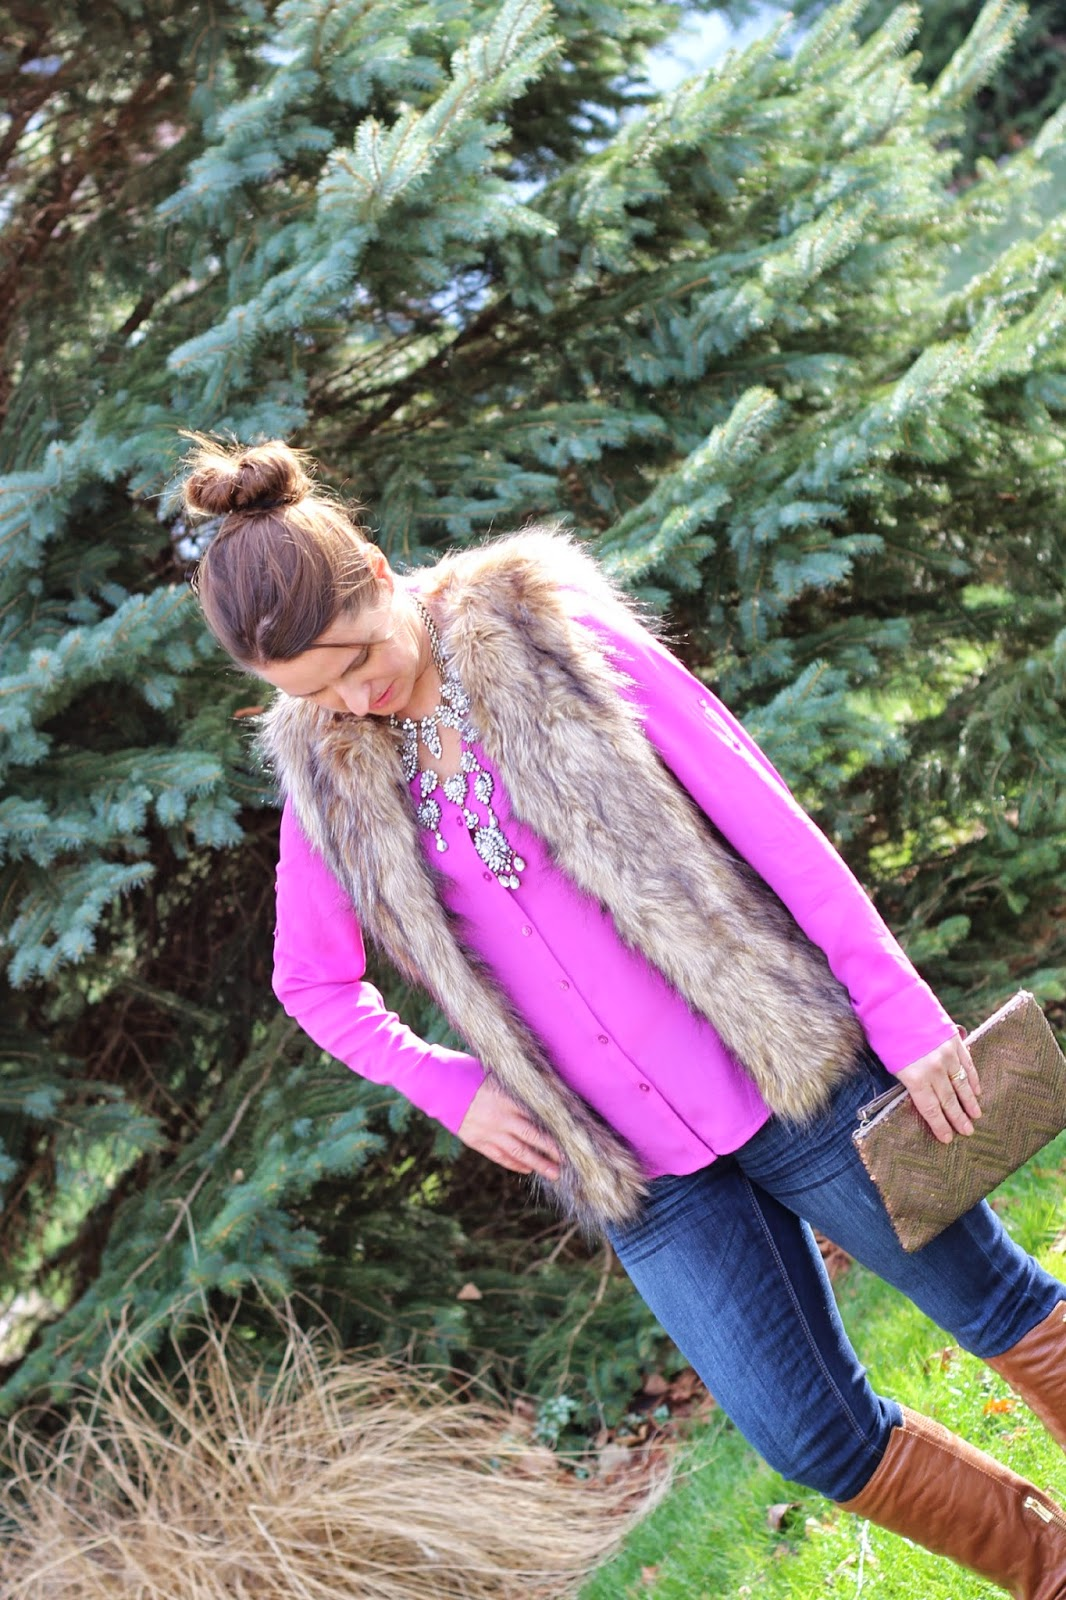 Express Portifino blouse, radiant orchid blouse, fall outfit, faux fur vest, cognac boots, sequin clutch